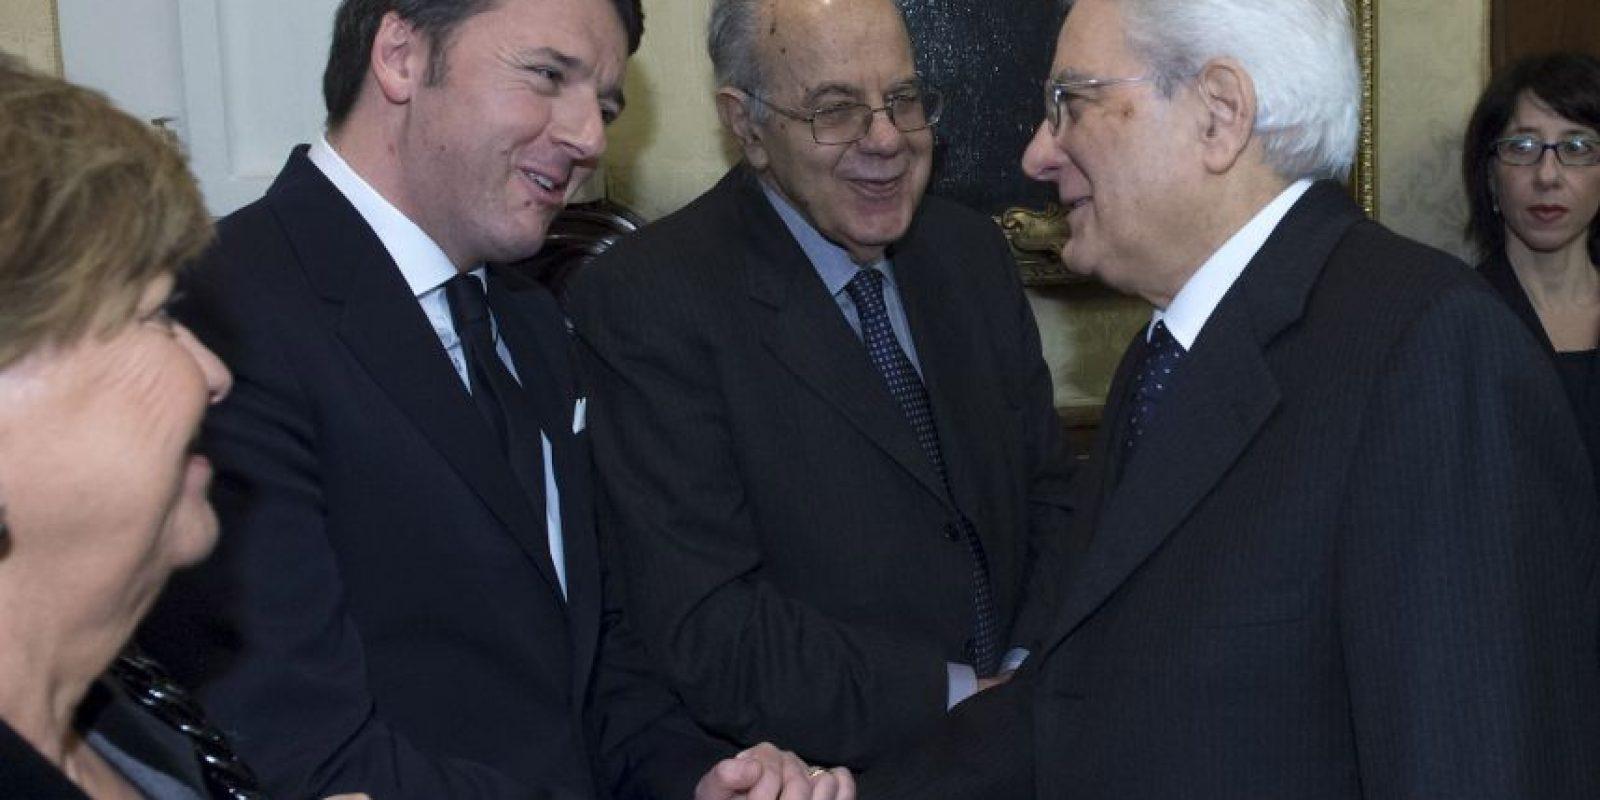 Aquí con el Primer ministro Matteo Renzi. Foto:Getty Images